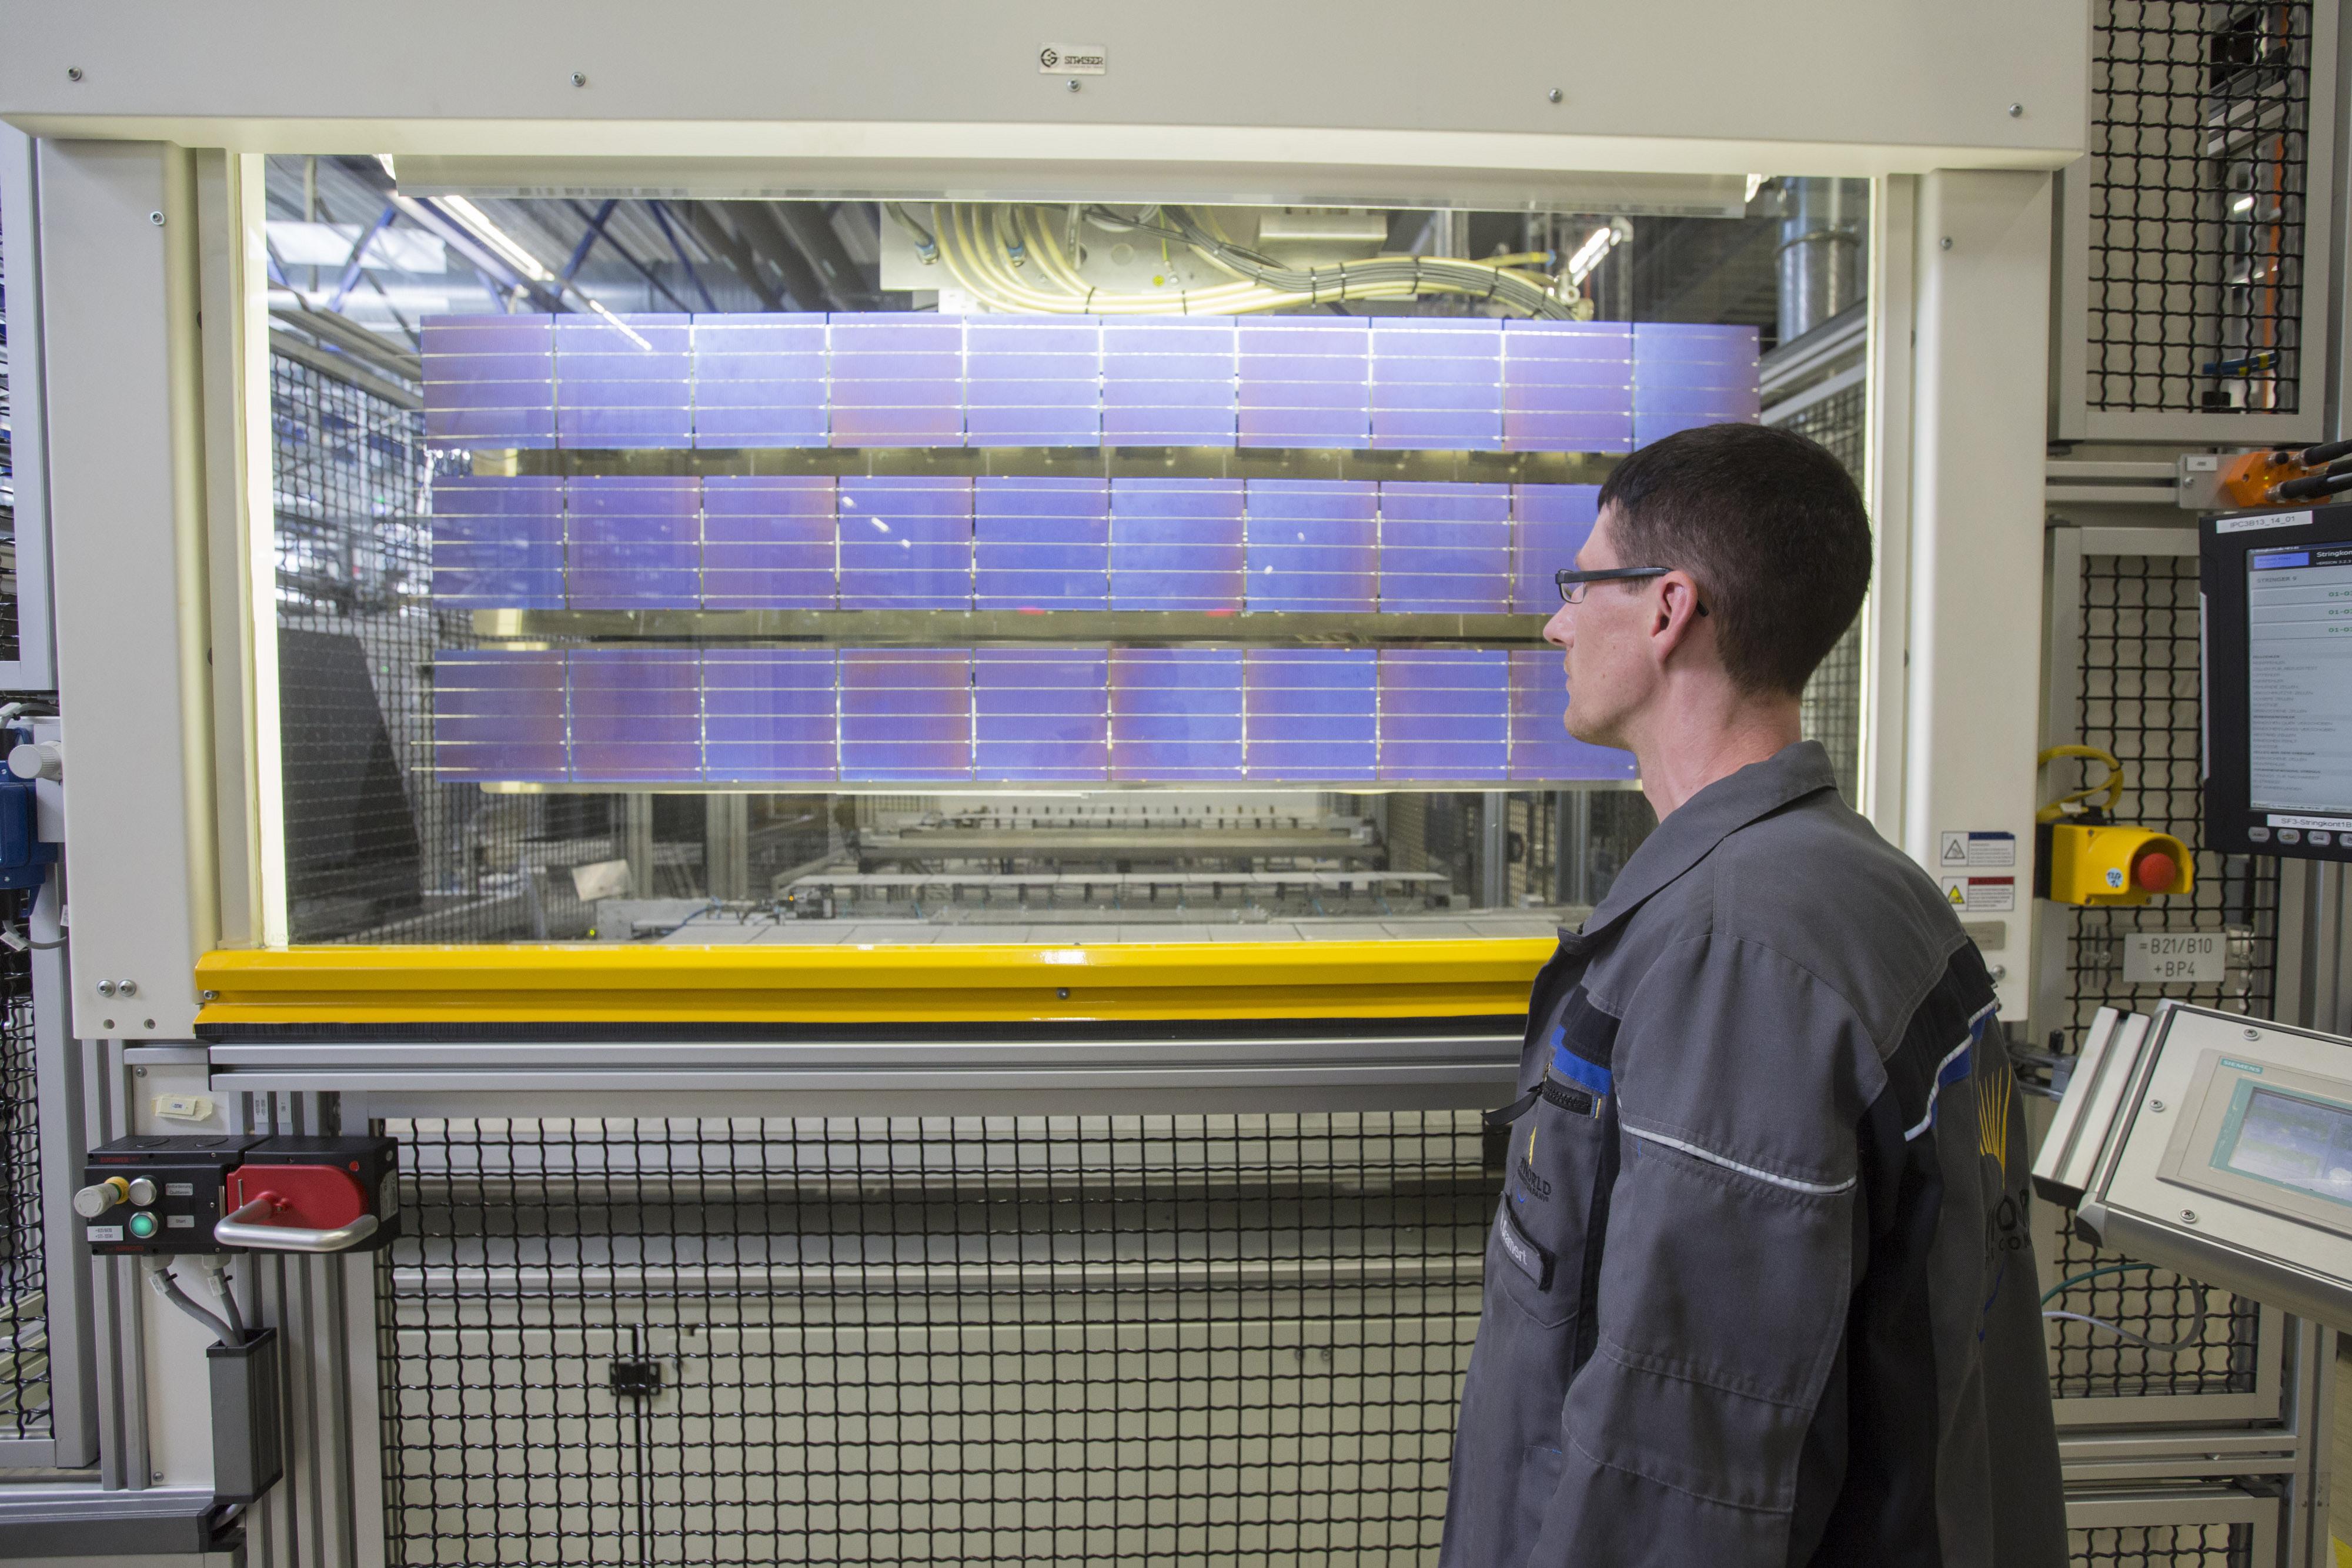 Solar Panel Maker Wins Trade Commission Finding Tariff